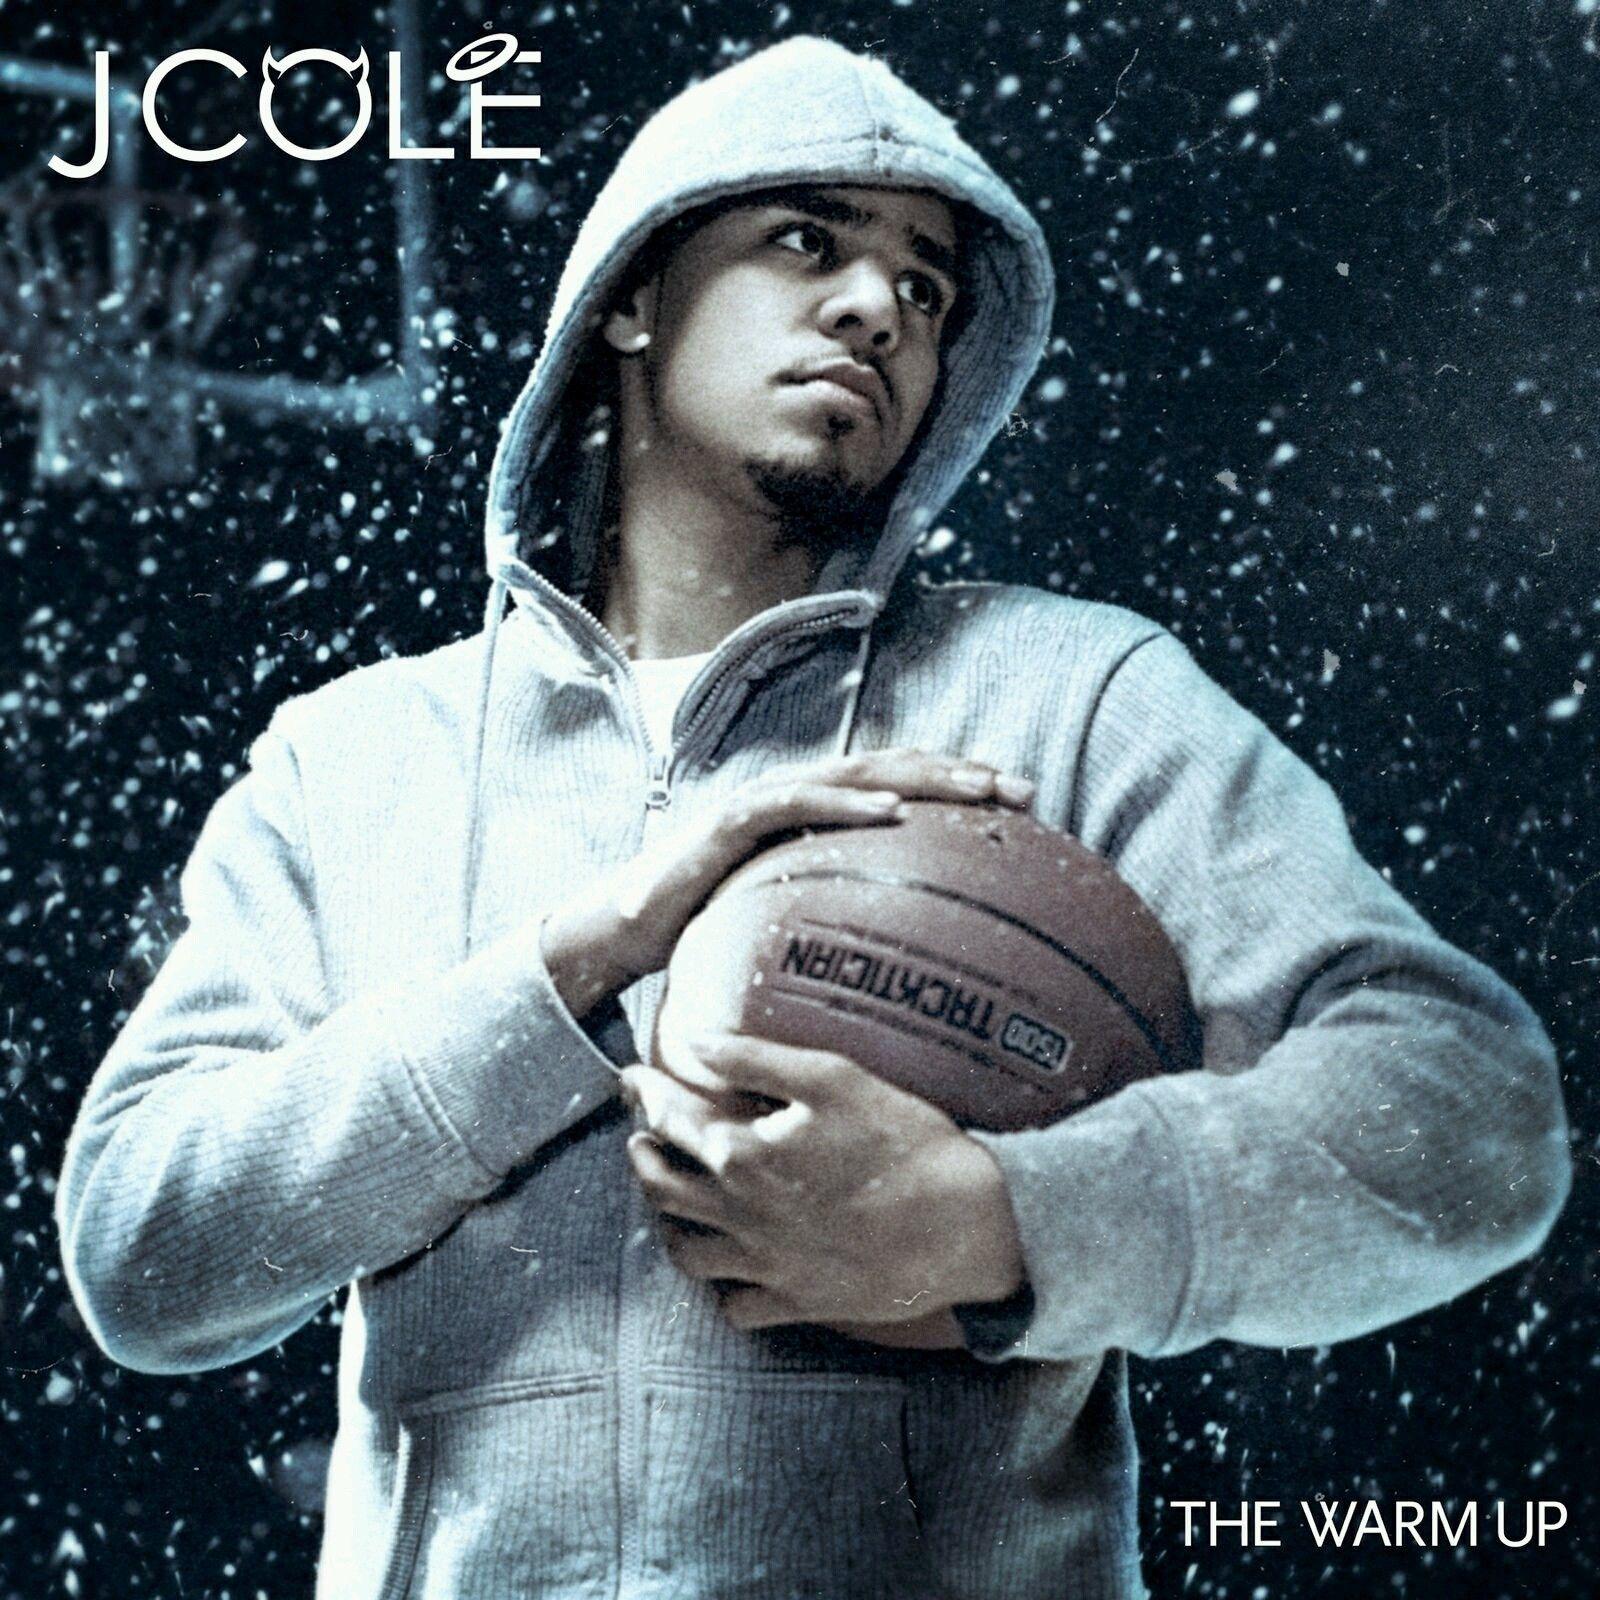 J COLE The Warm Up 2009 Album Cover Basketball Rap Hip Hop Poster 50